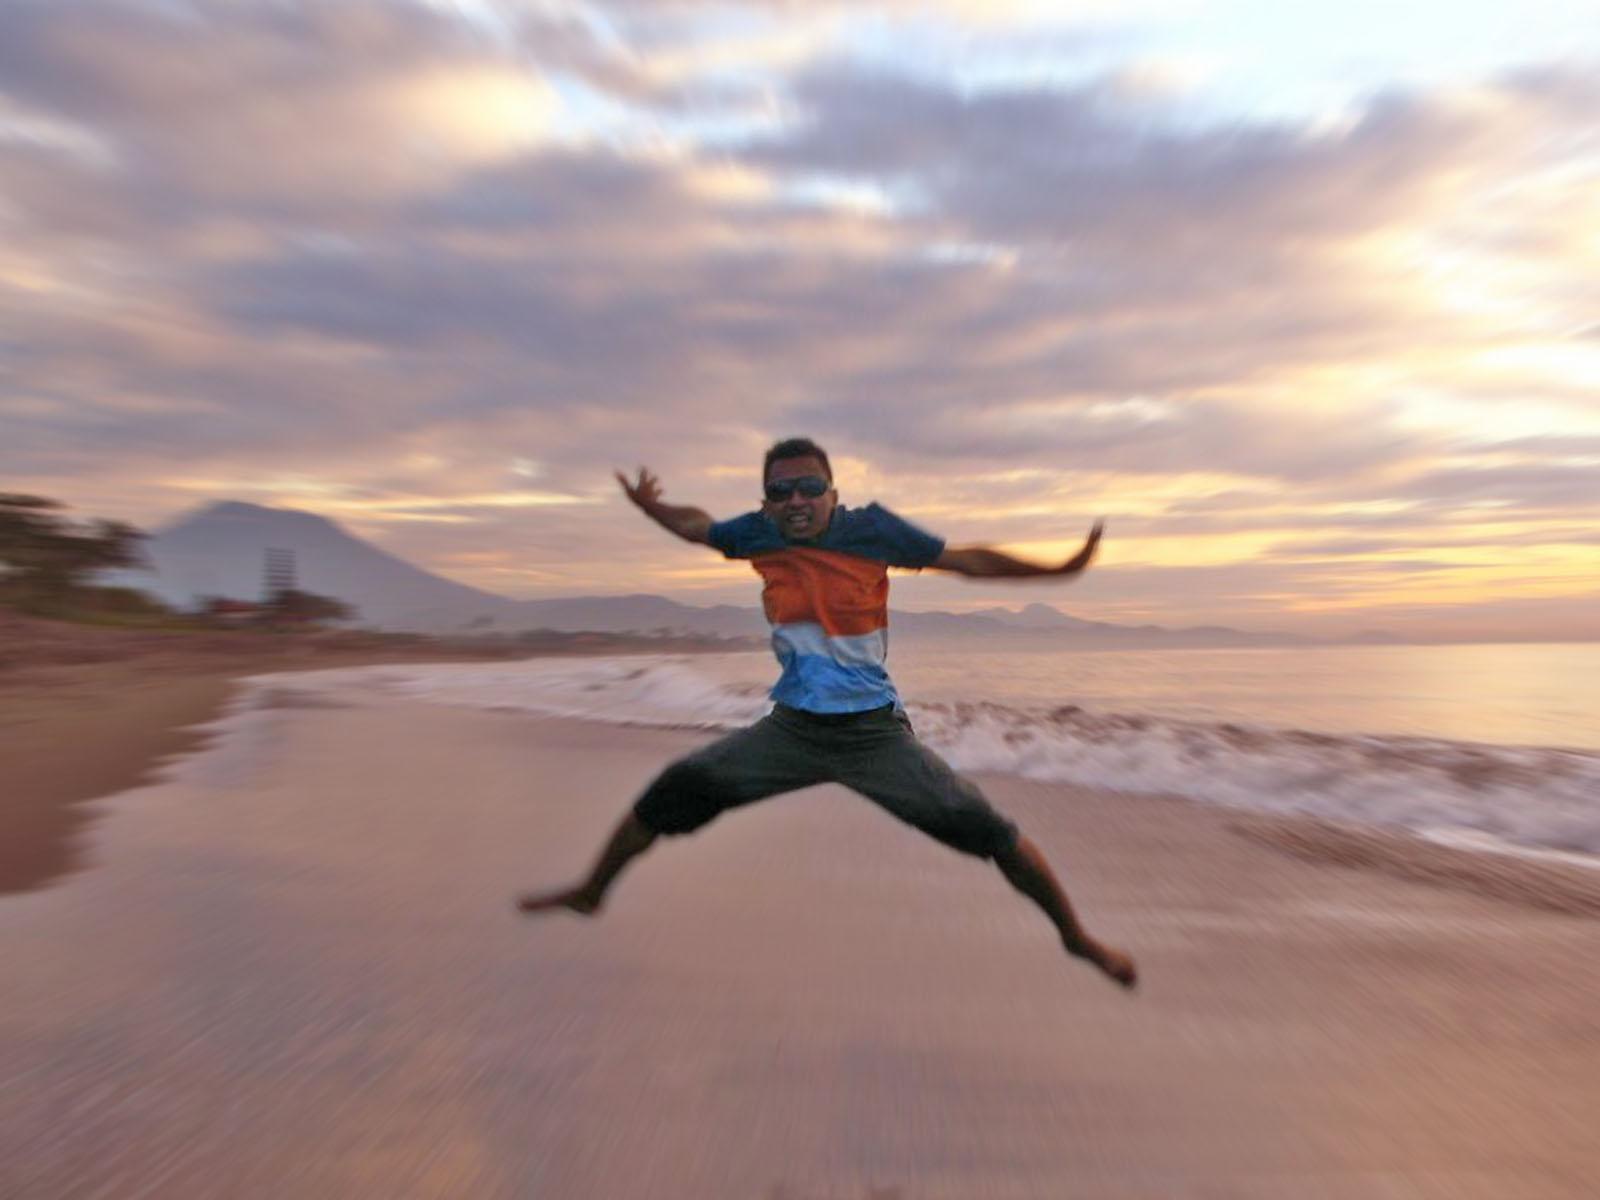 Jump to fly along the coast photo